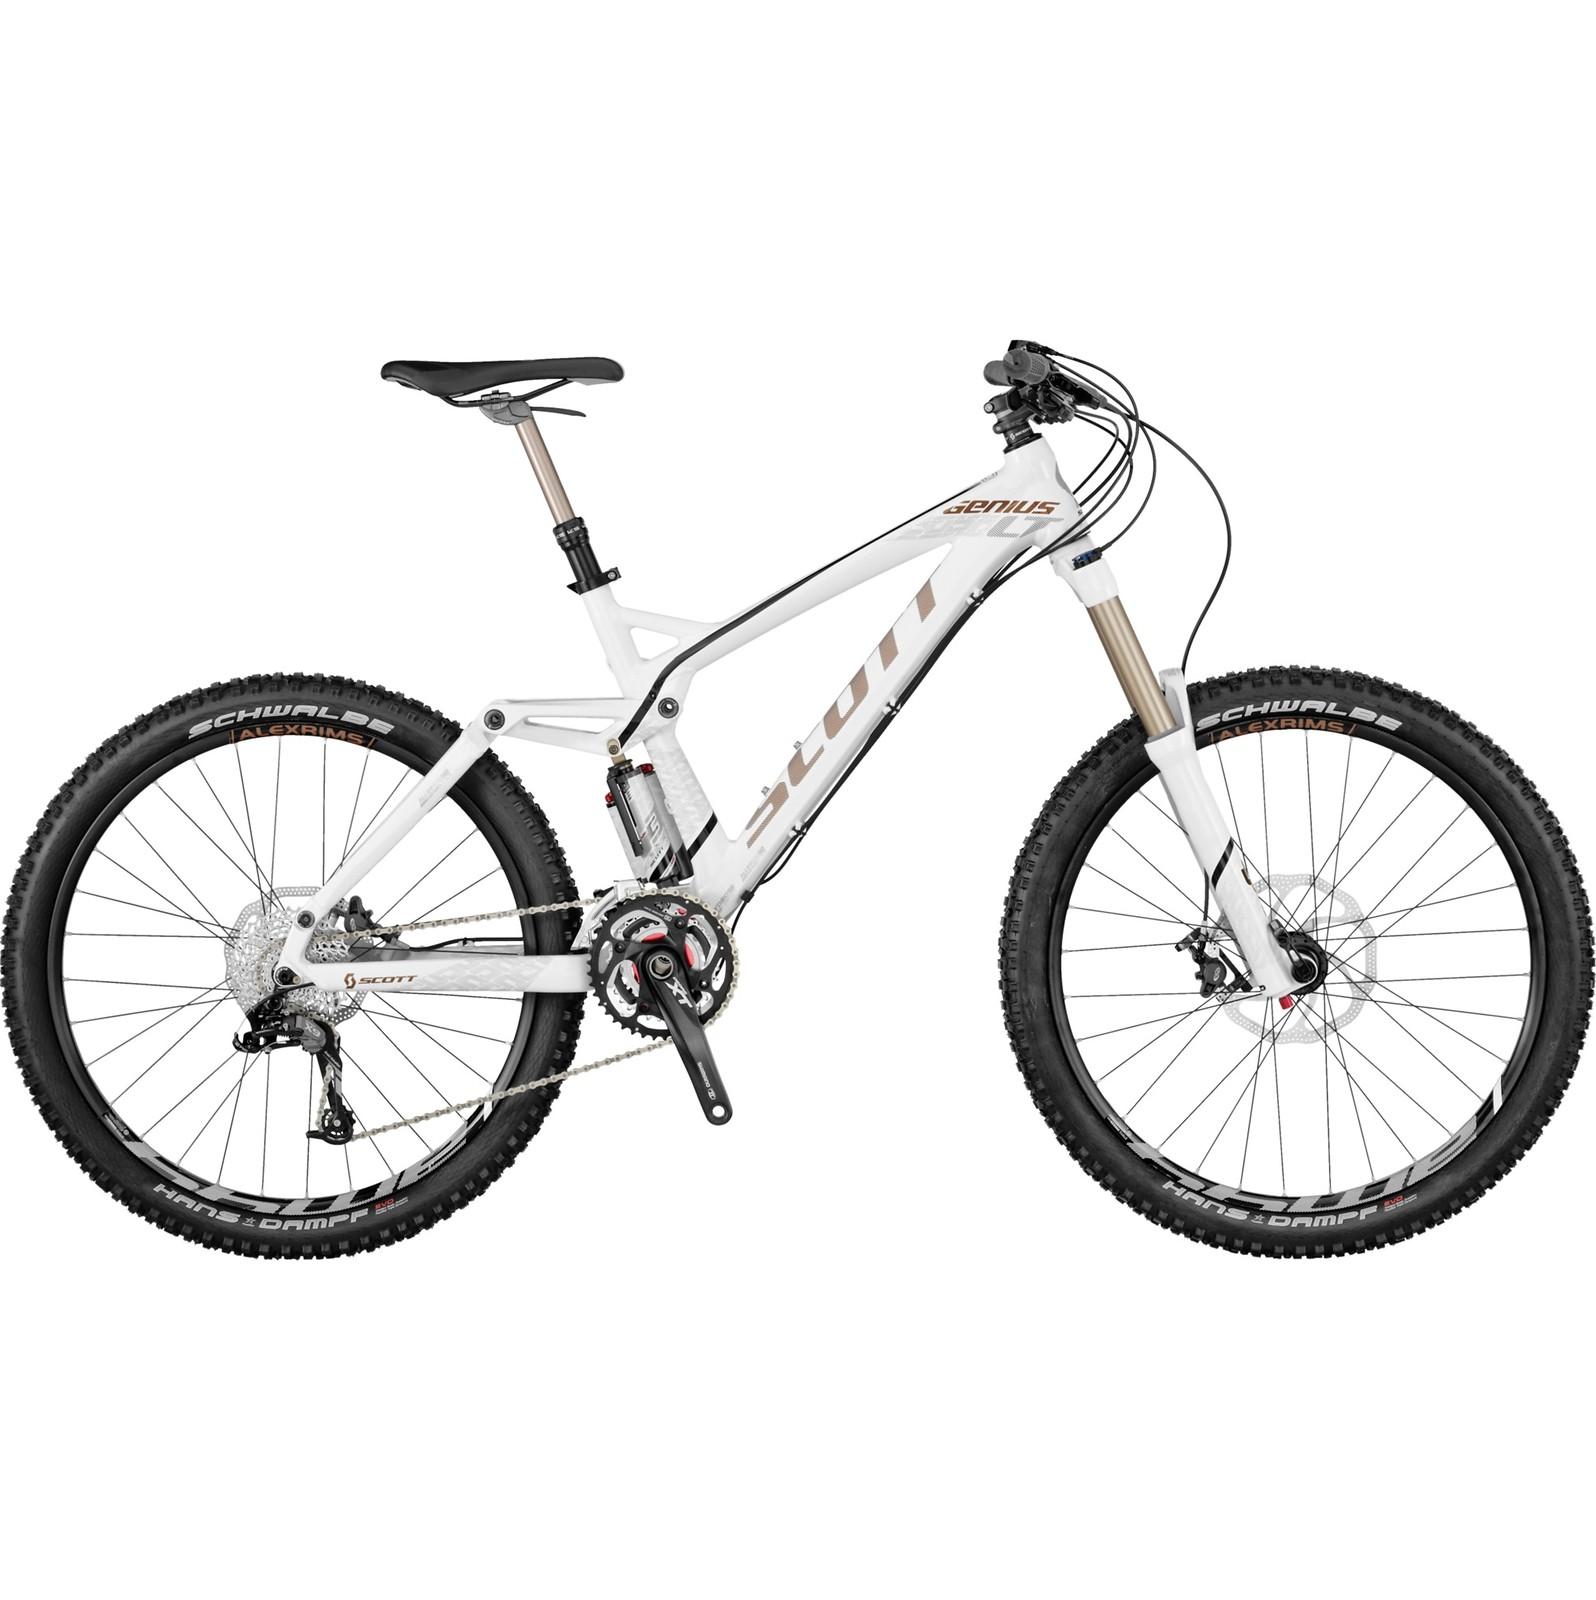 2012 Scott Genius LT 30 Bike 221736